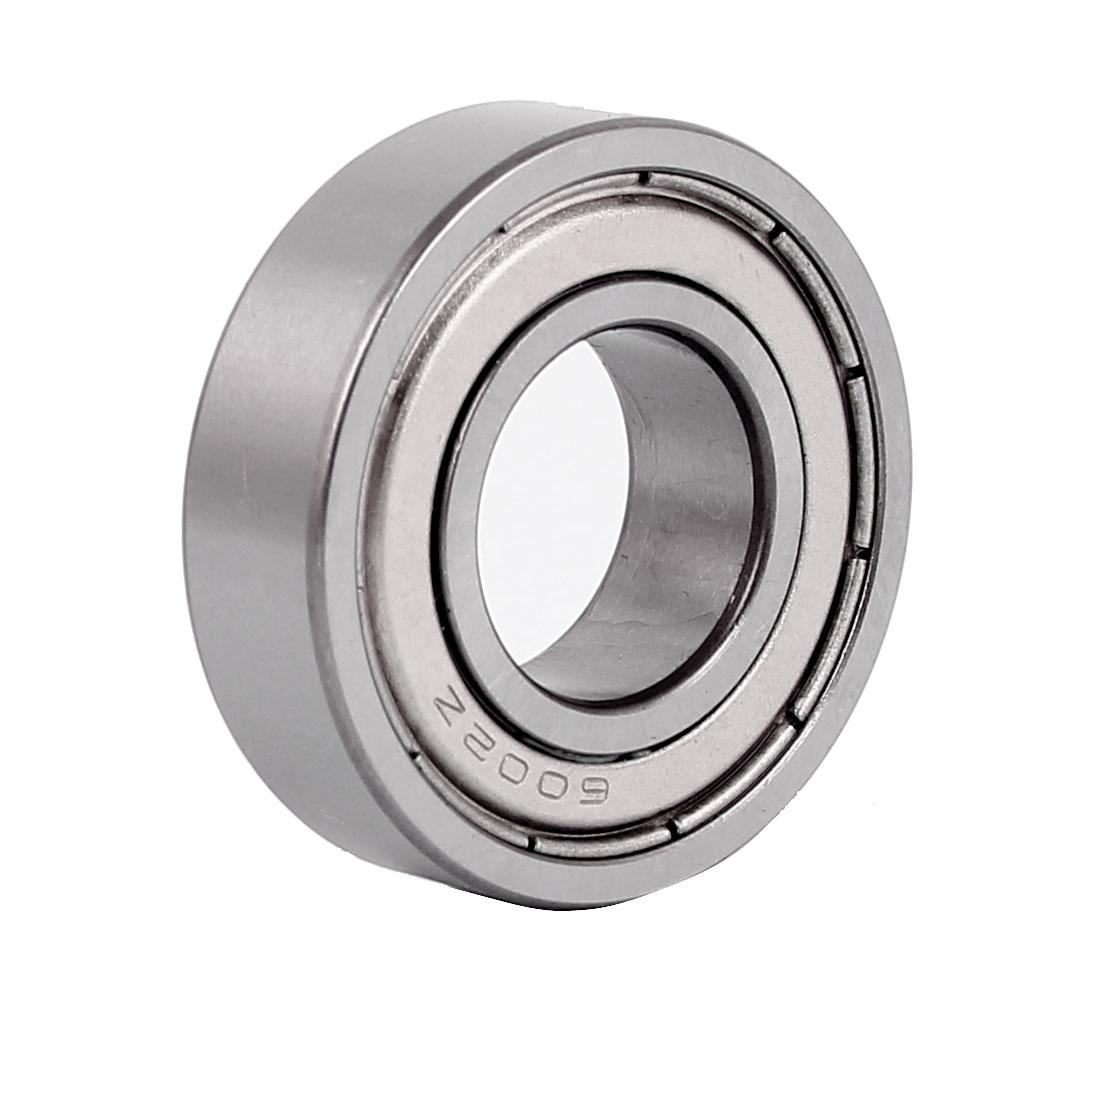 ZZ6002 Double Shielded Deep Groove Ball Bearing 32mmx15mmx9mm